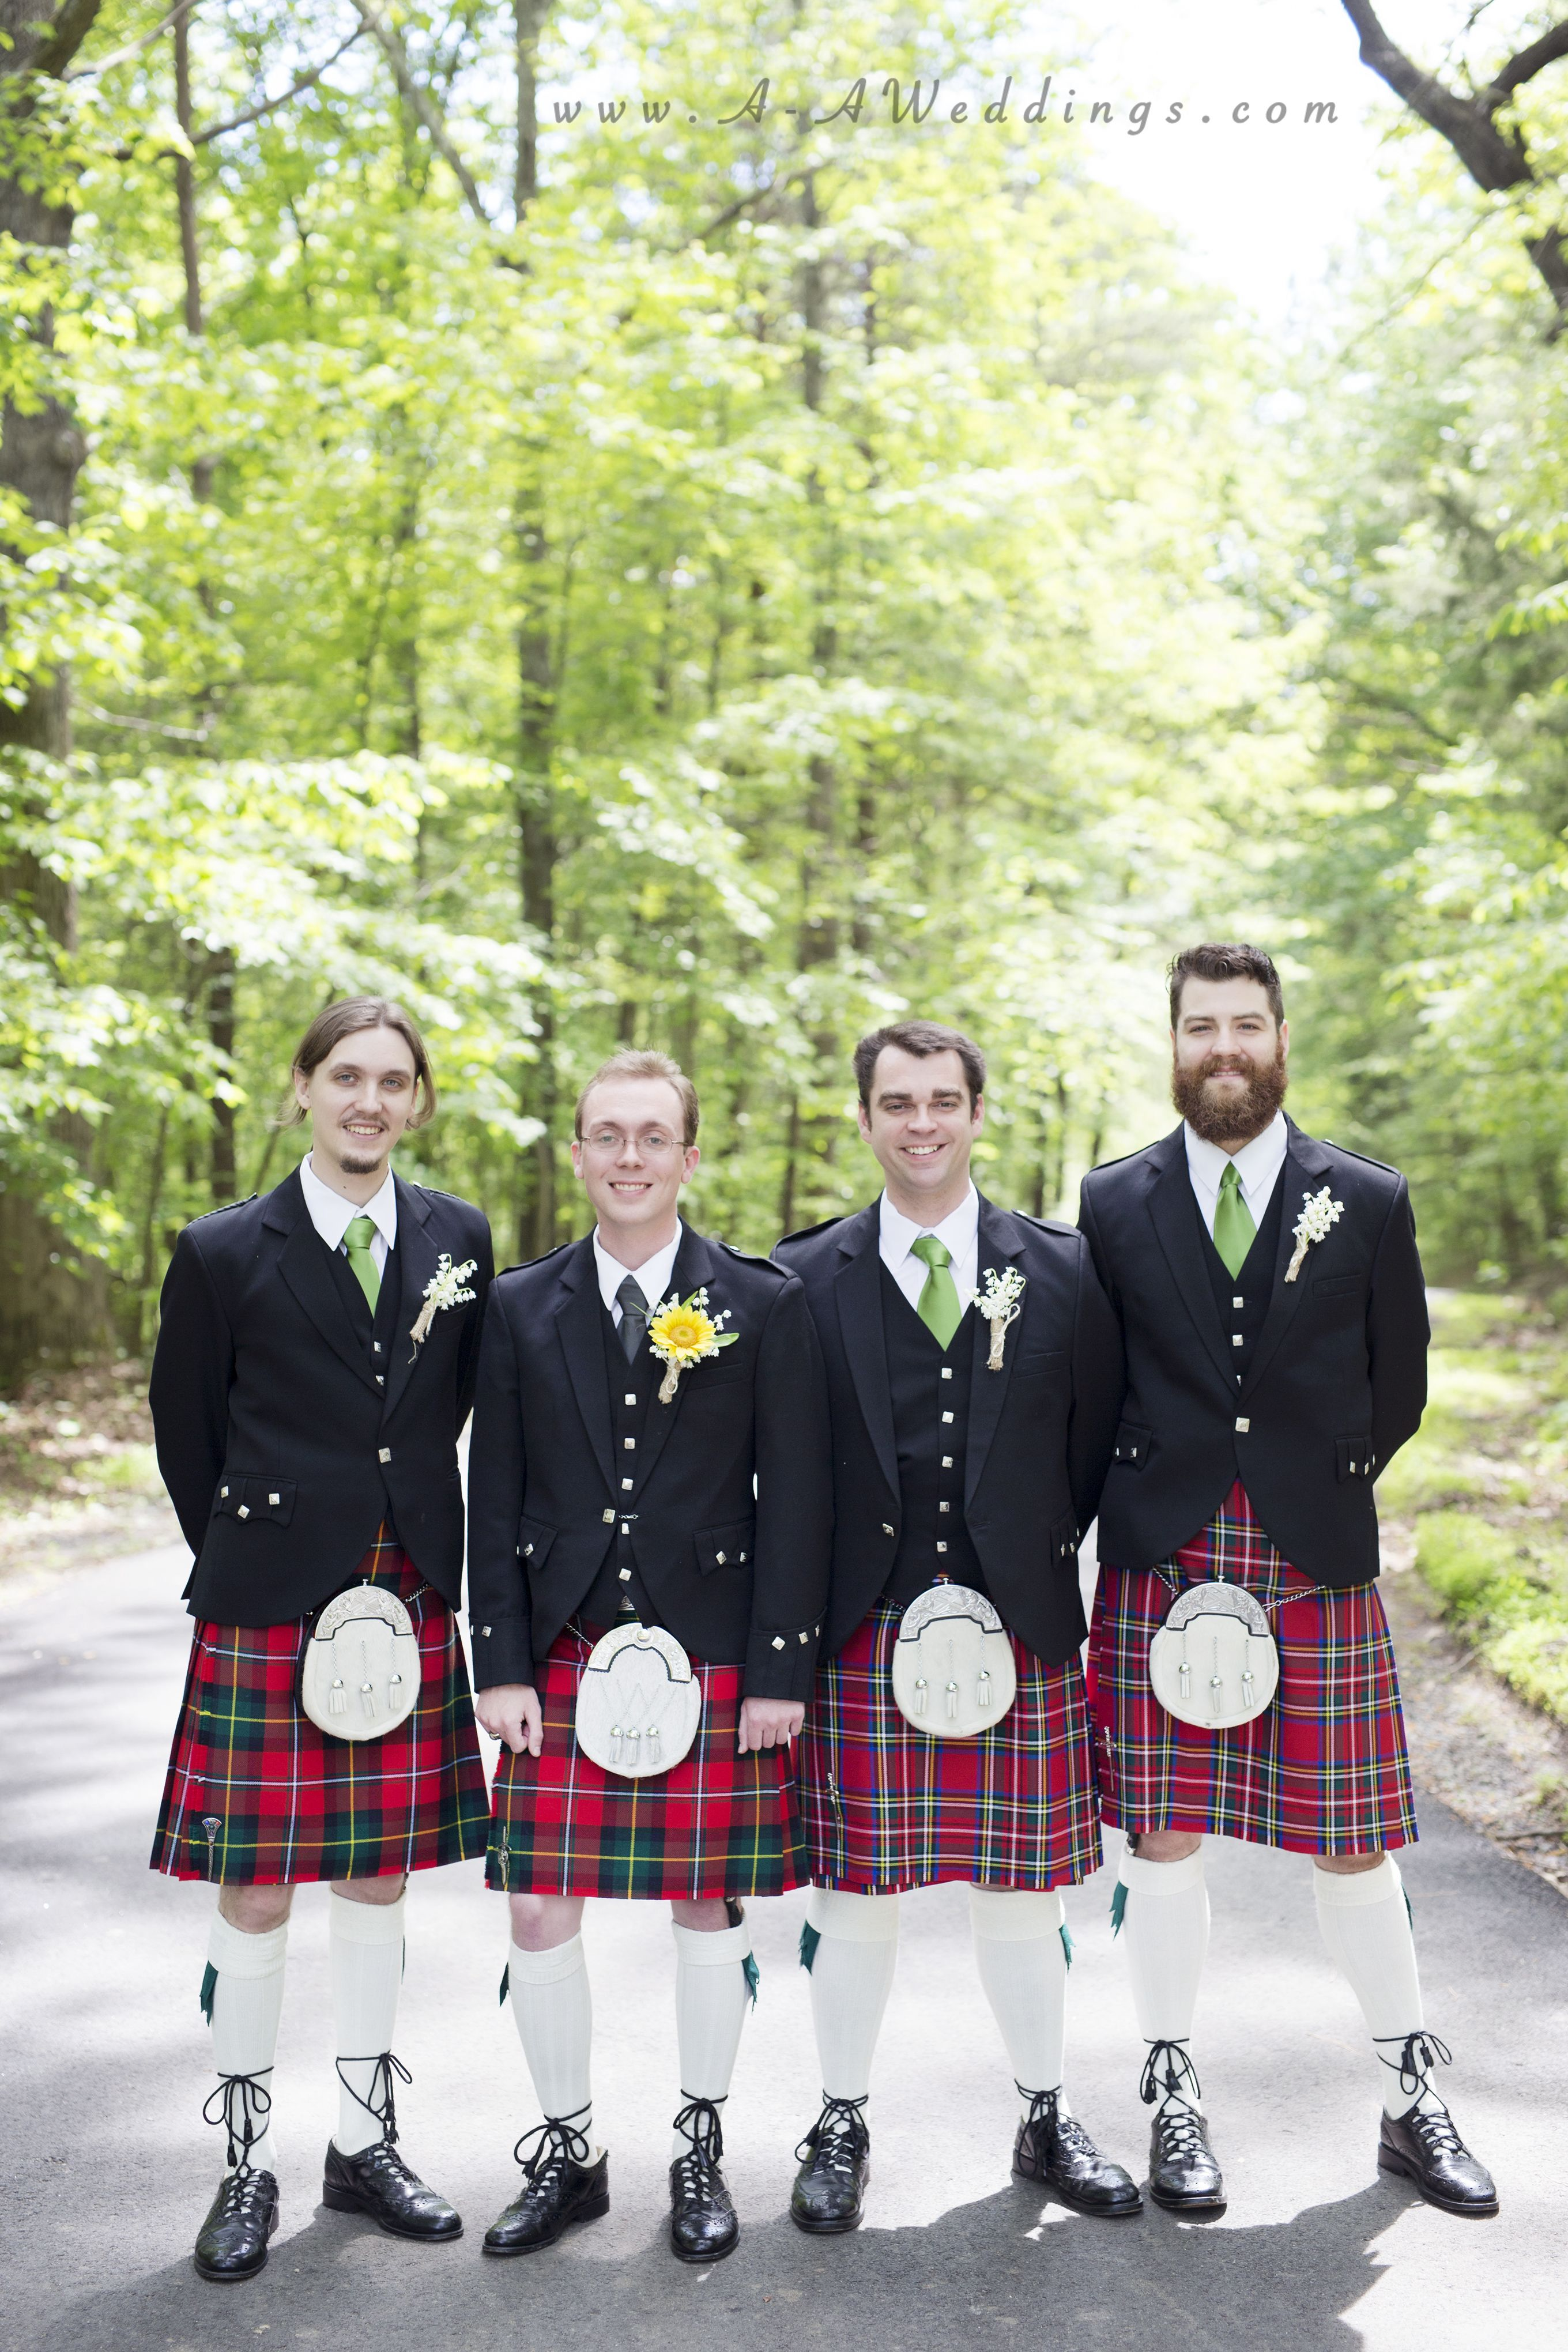 Spruce Pine Lodge Durham, NC Wedding Photographer Scottish wedding, bride, groom, wedding party, spruce pine lodge